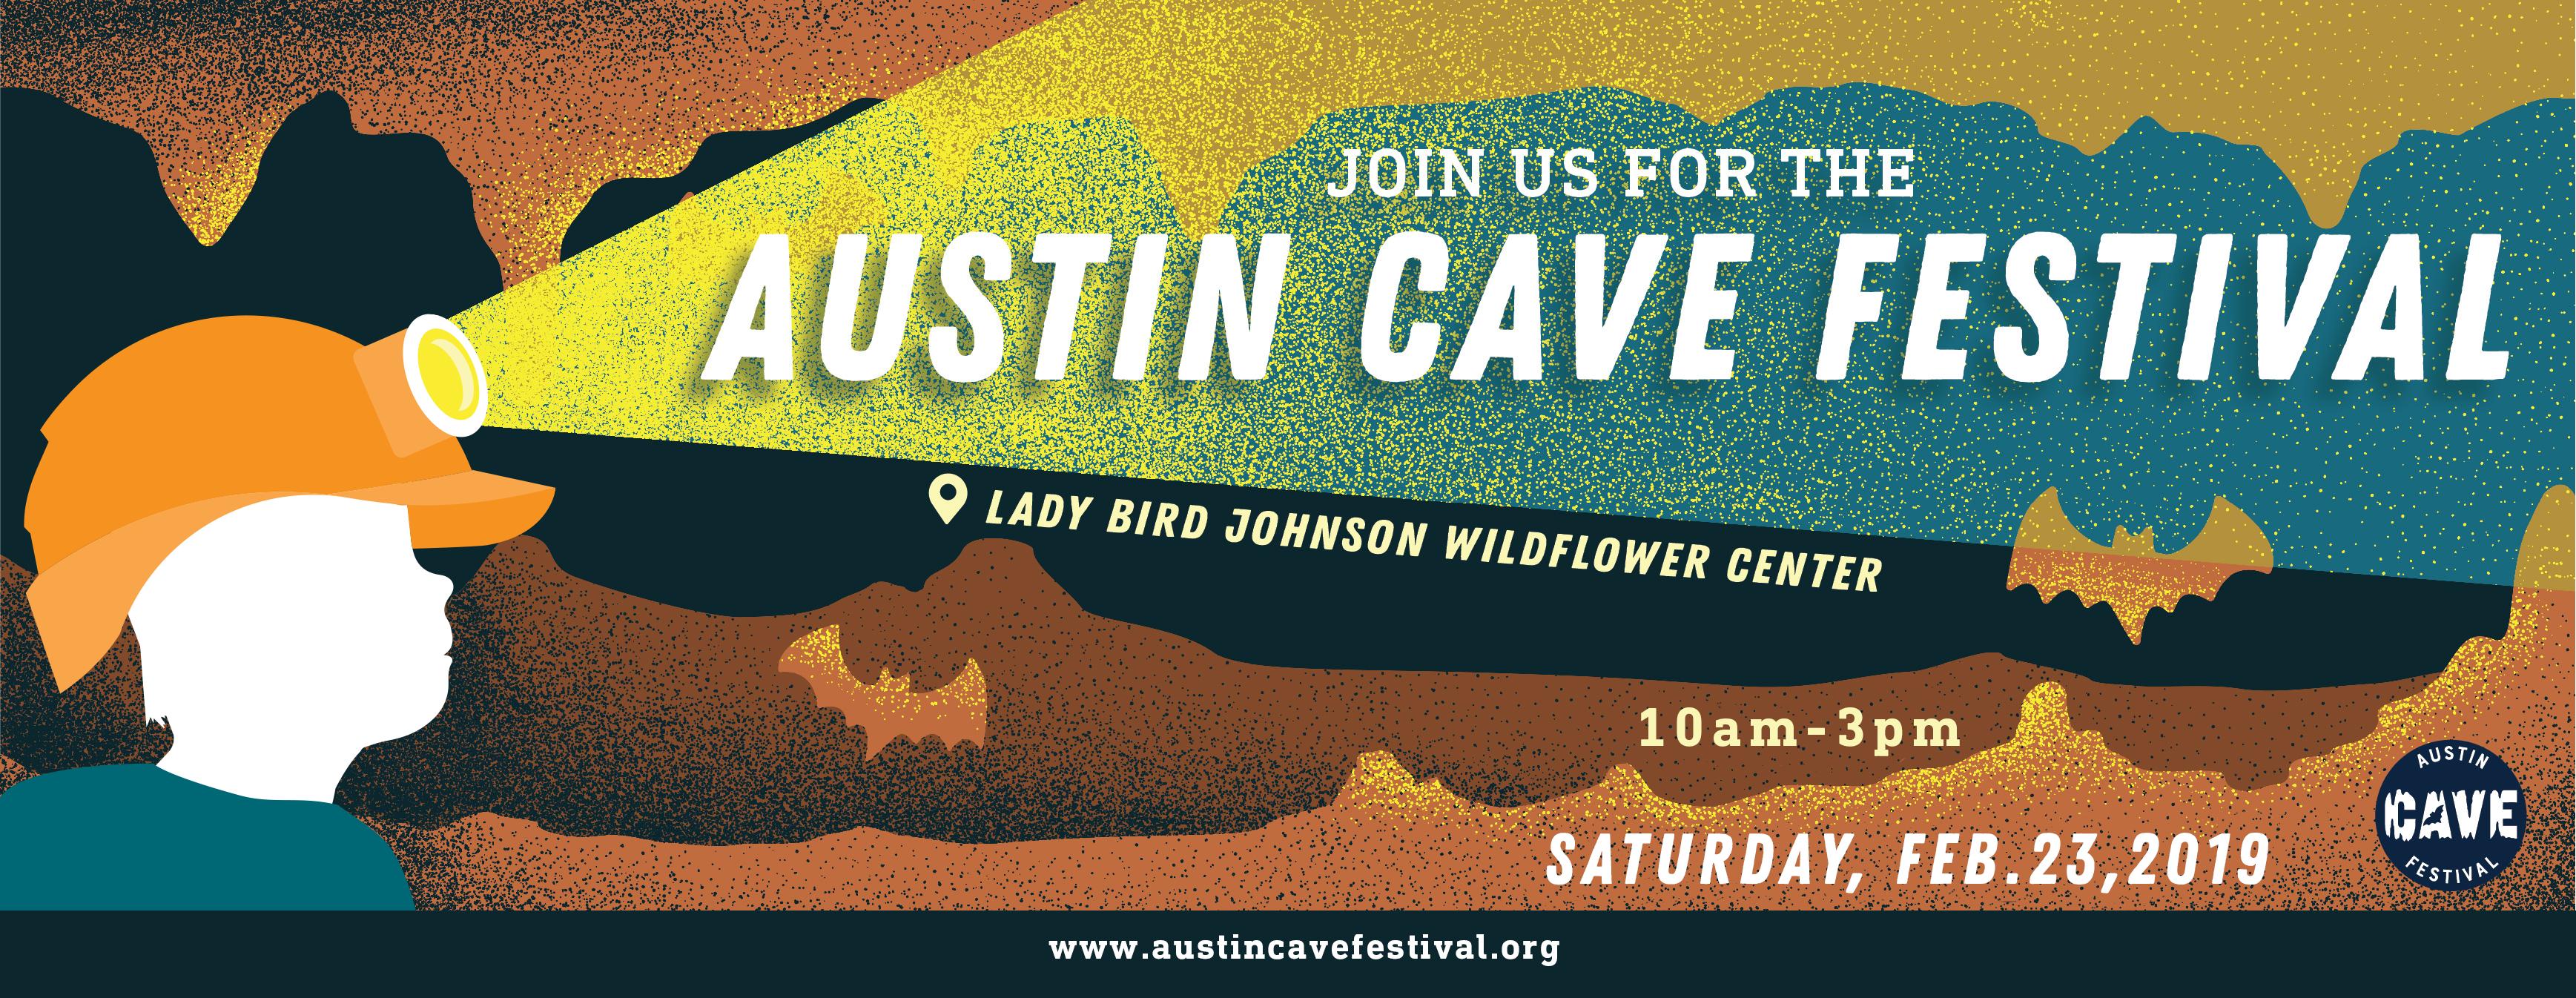 Austin Cave Festival - Barton Springs Edwards Aquifer